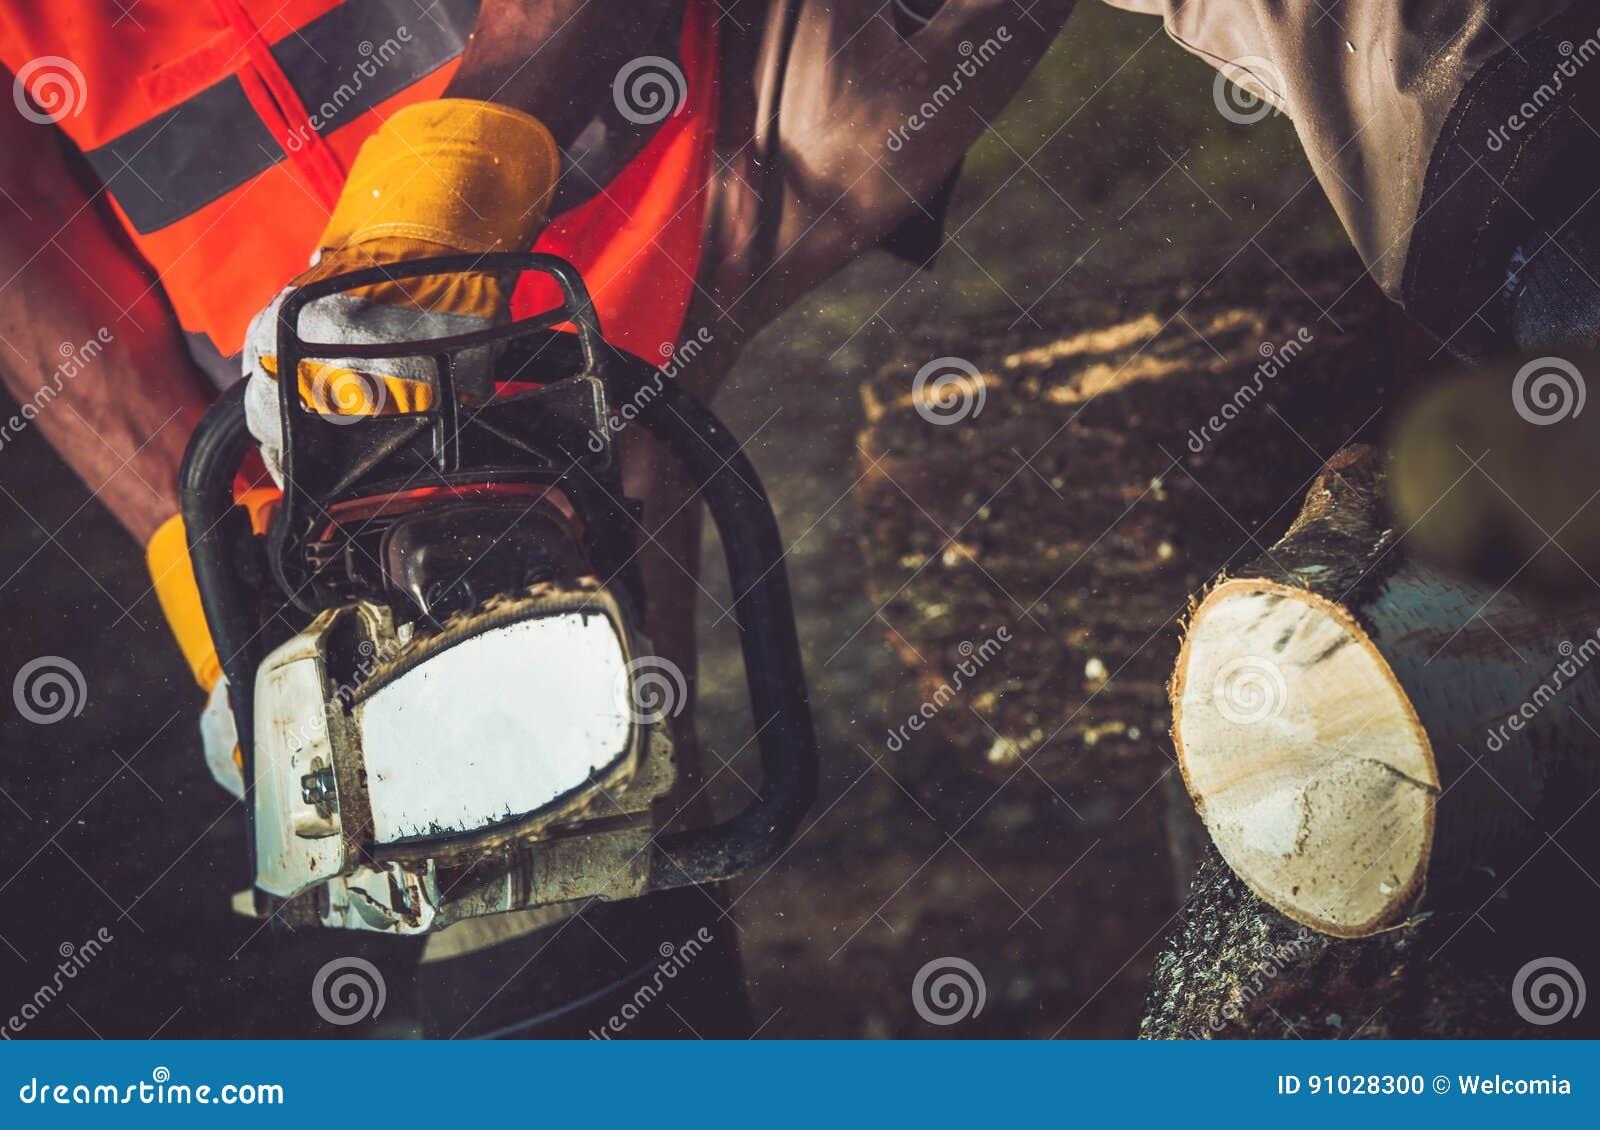 Download Firewood Logs Cutting stock photo. Image of break, caucasian - 91028300